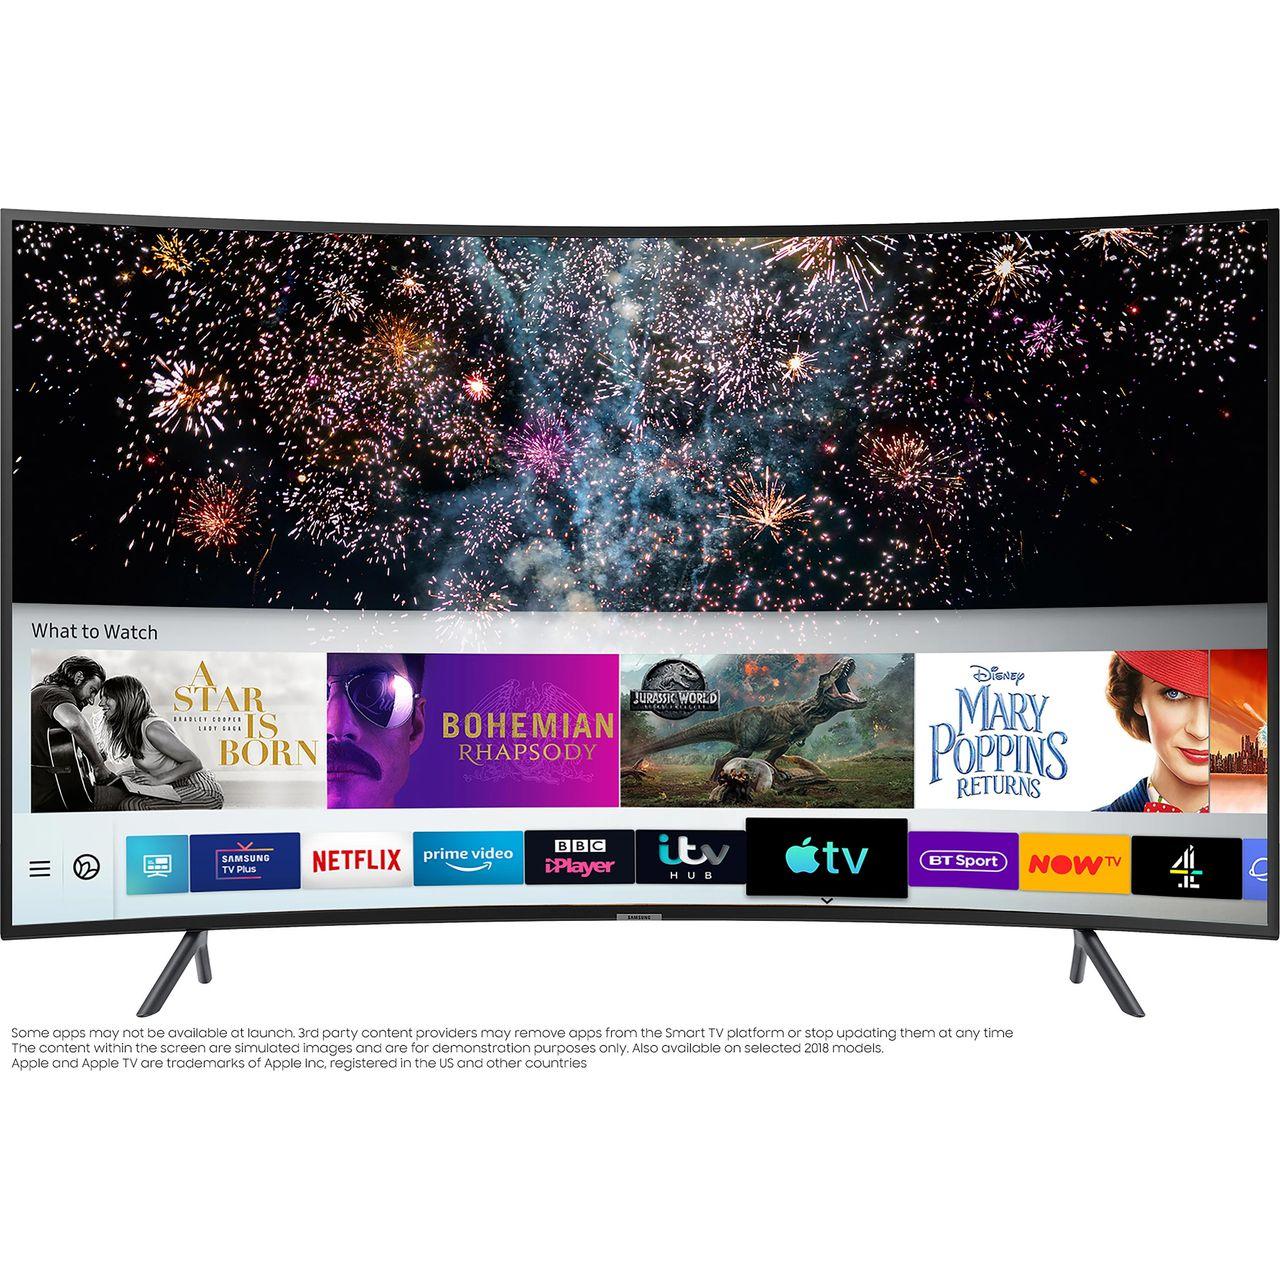 Samsung 65 in Curves 4K HDR10+ LED TV £579 @ AO